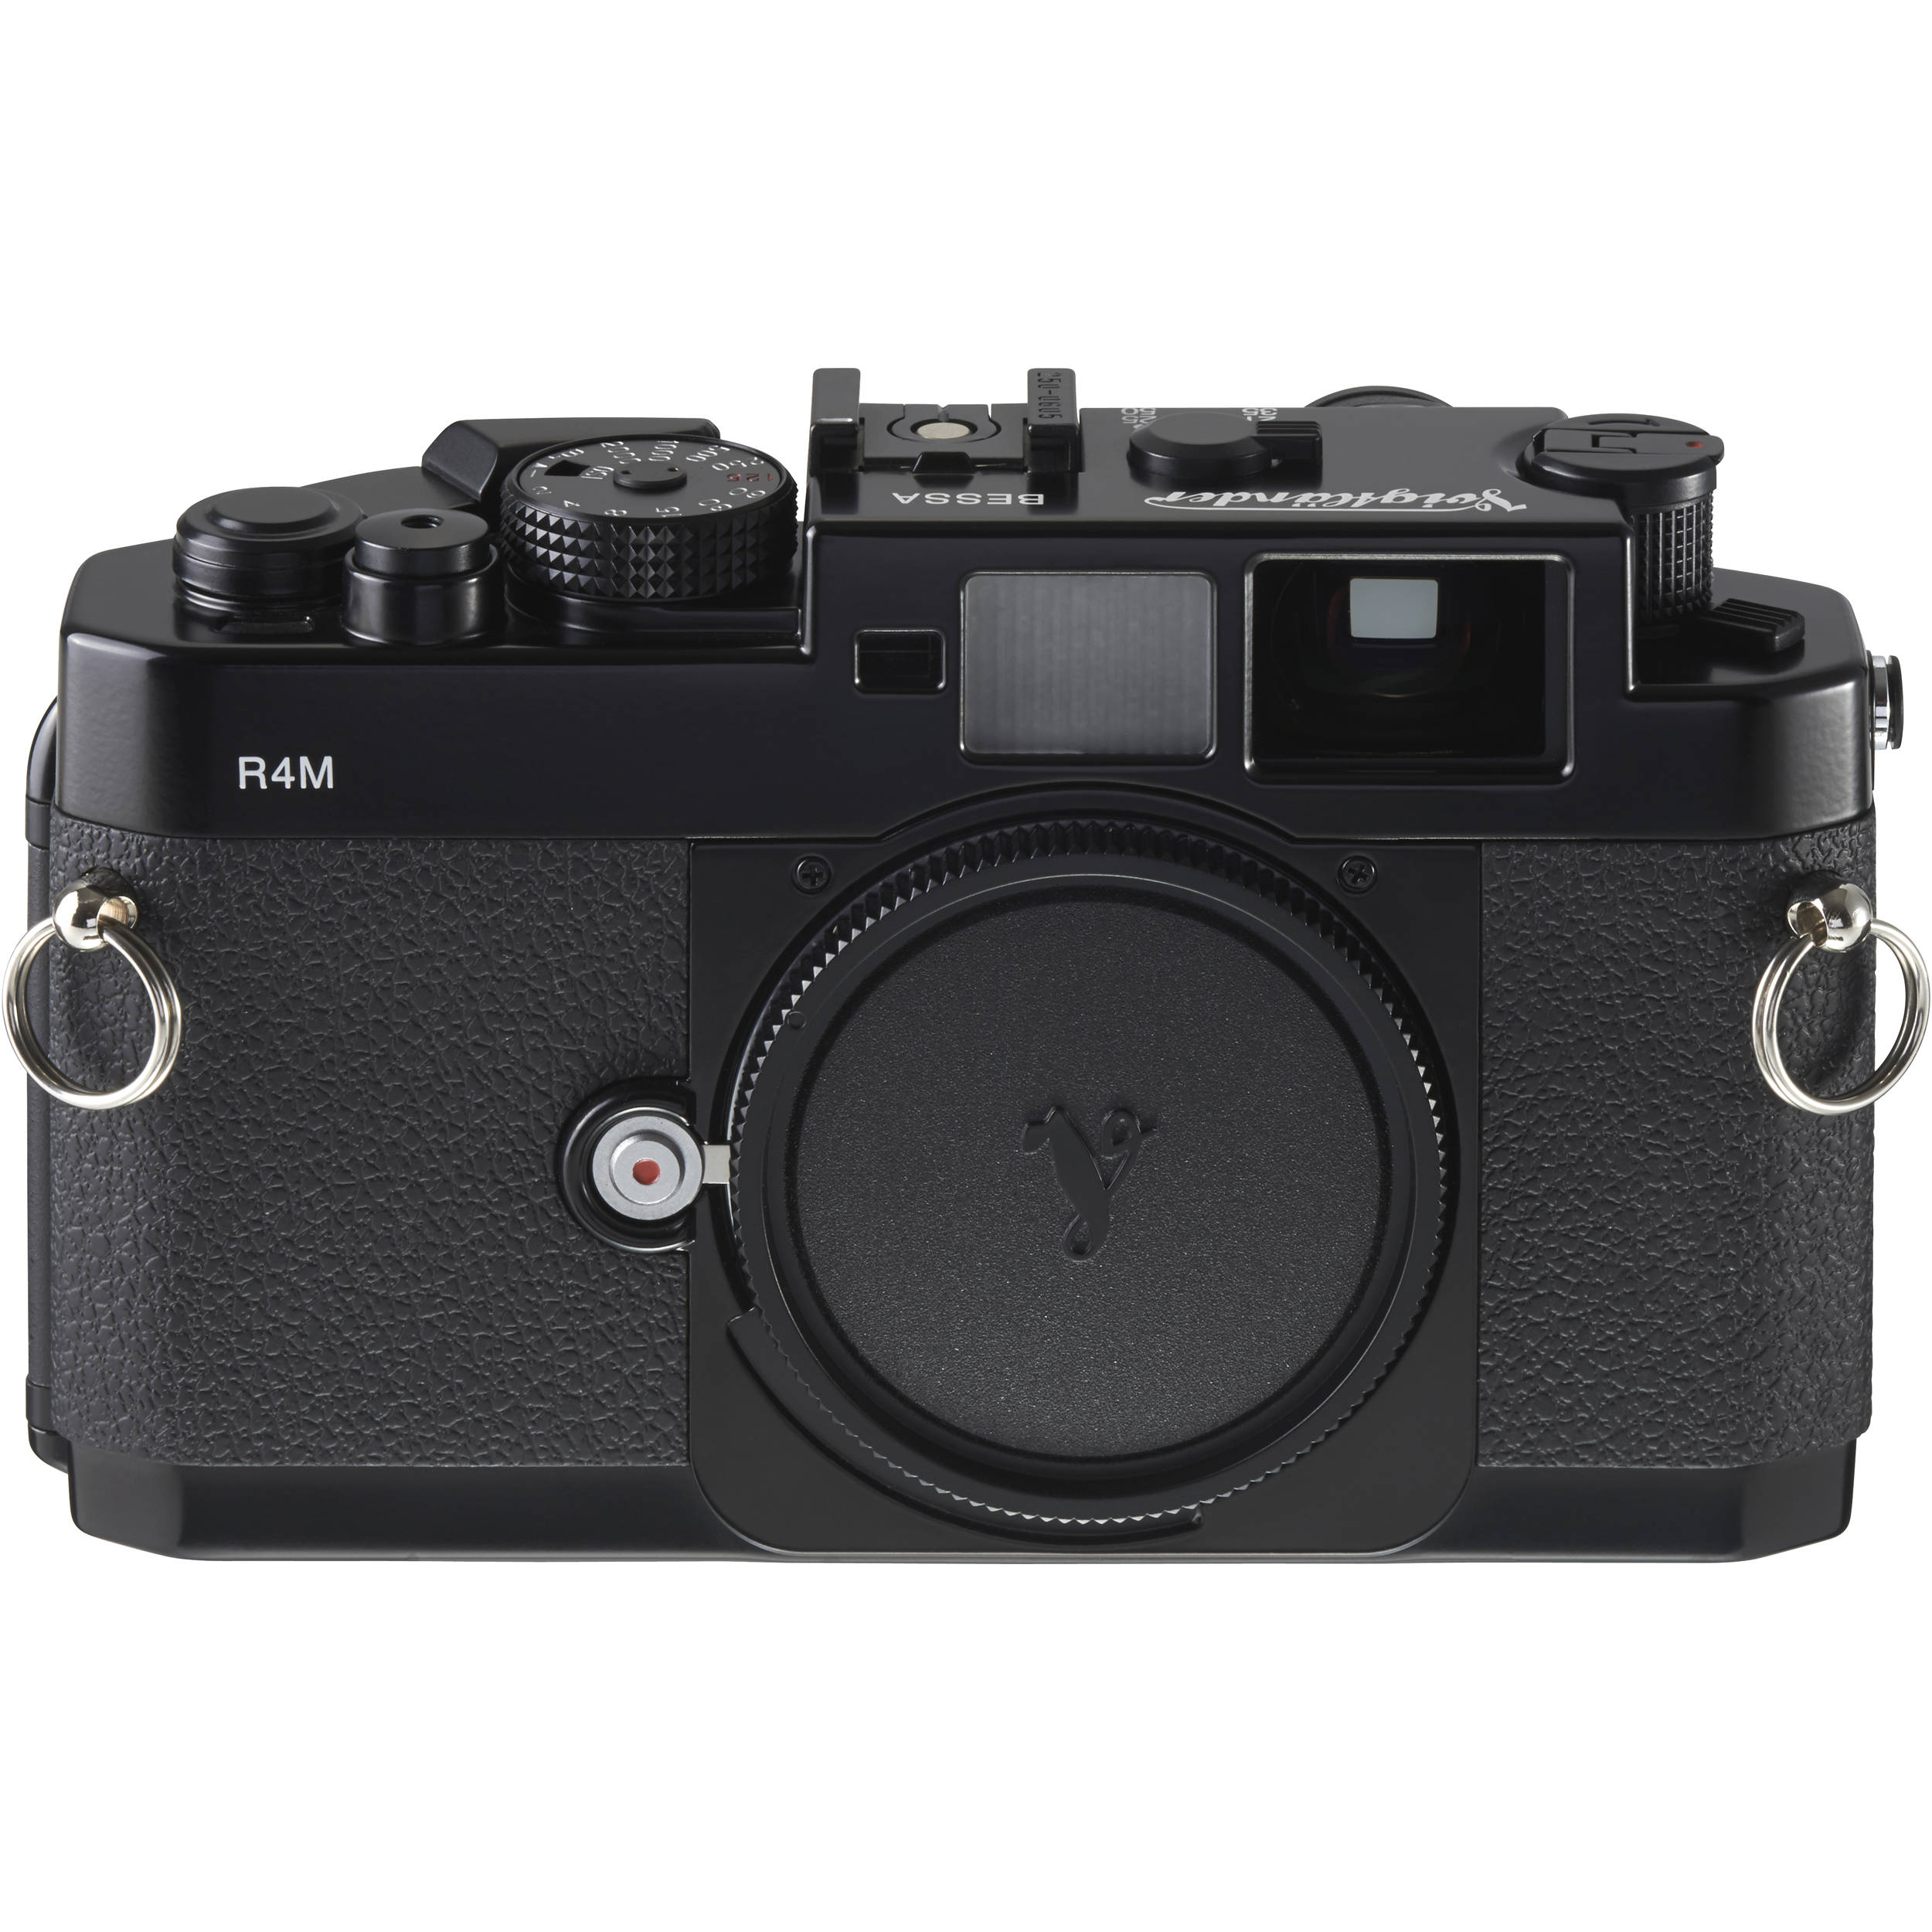 Voigtlander Bessa R4M Camera AA126A B&H Photo Video